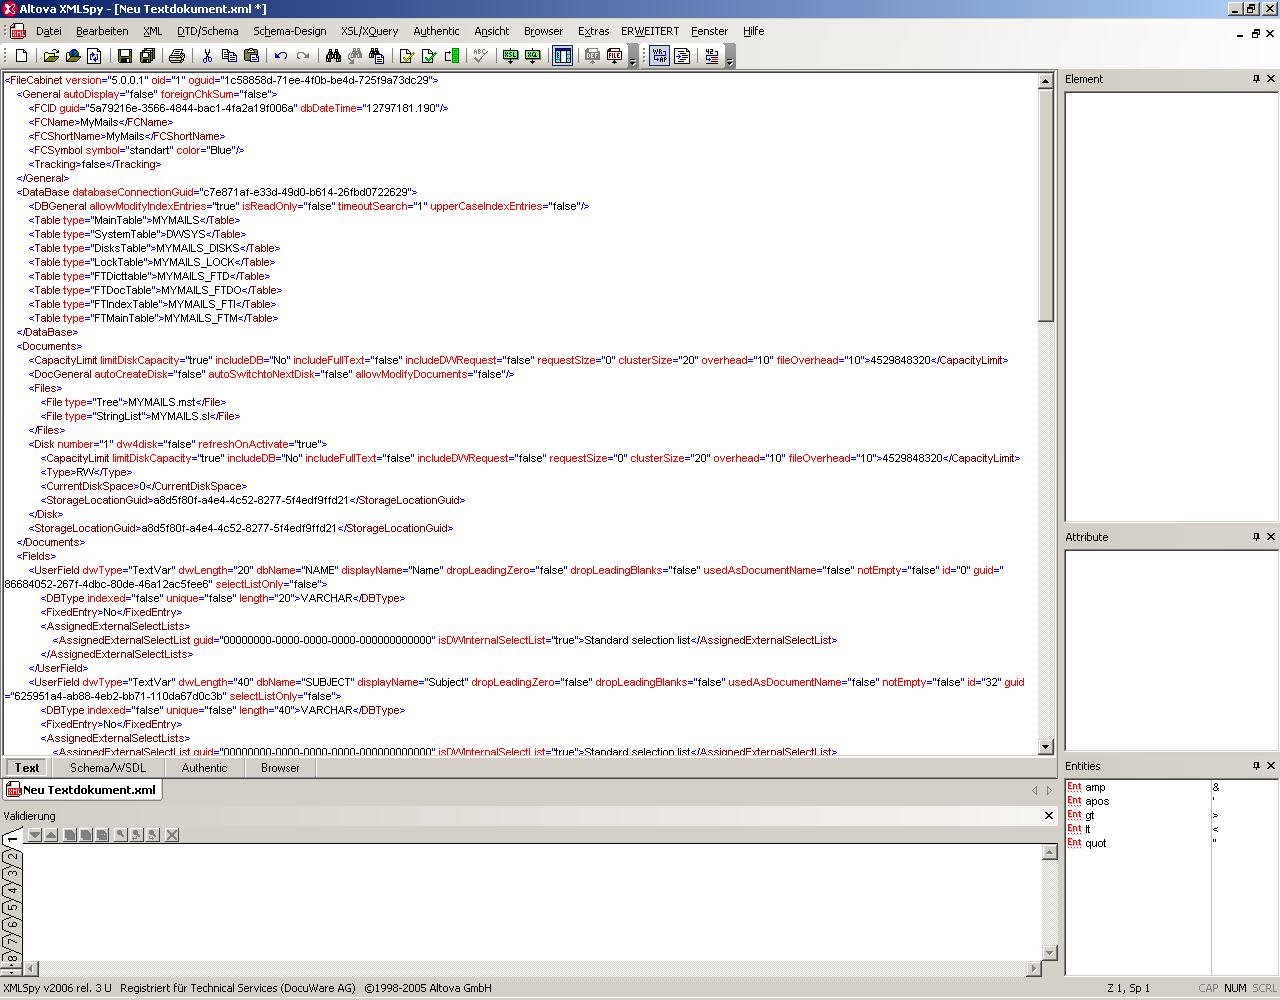 KBA-34330 · DocuWare Support Portal